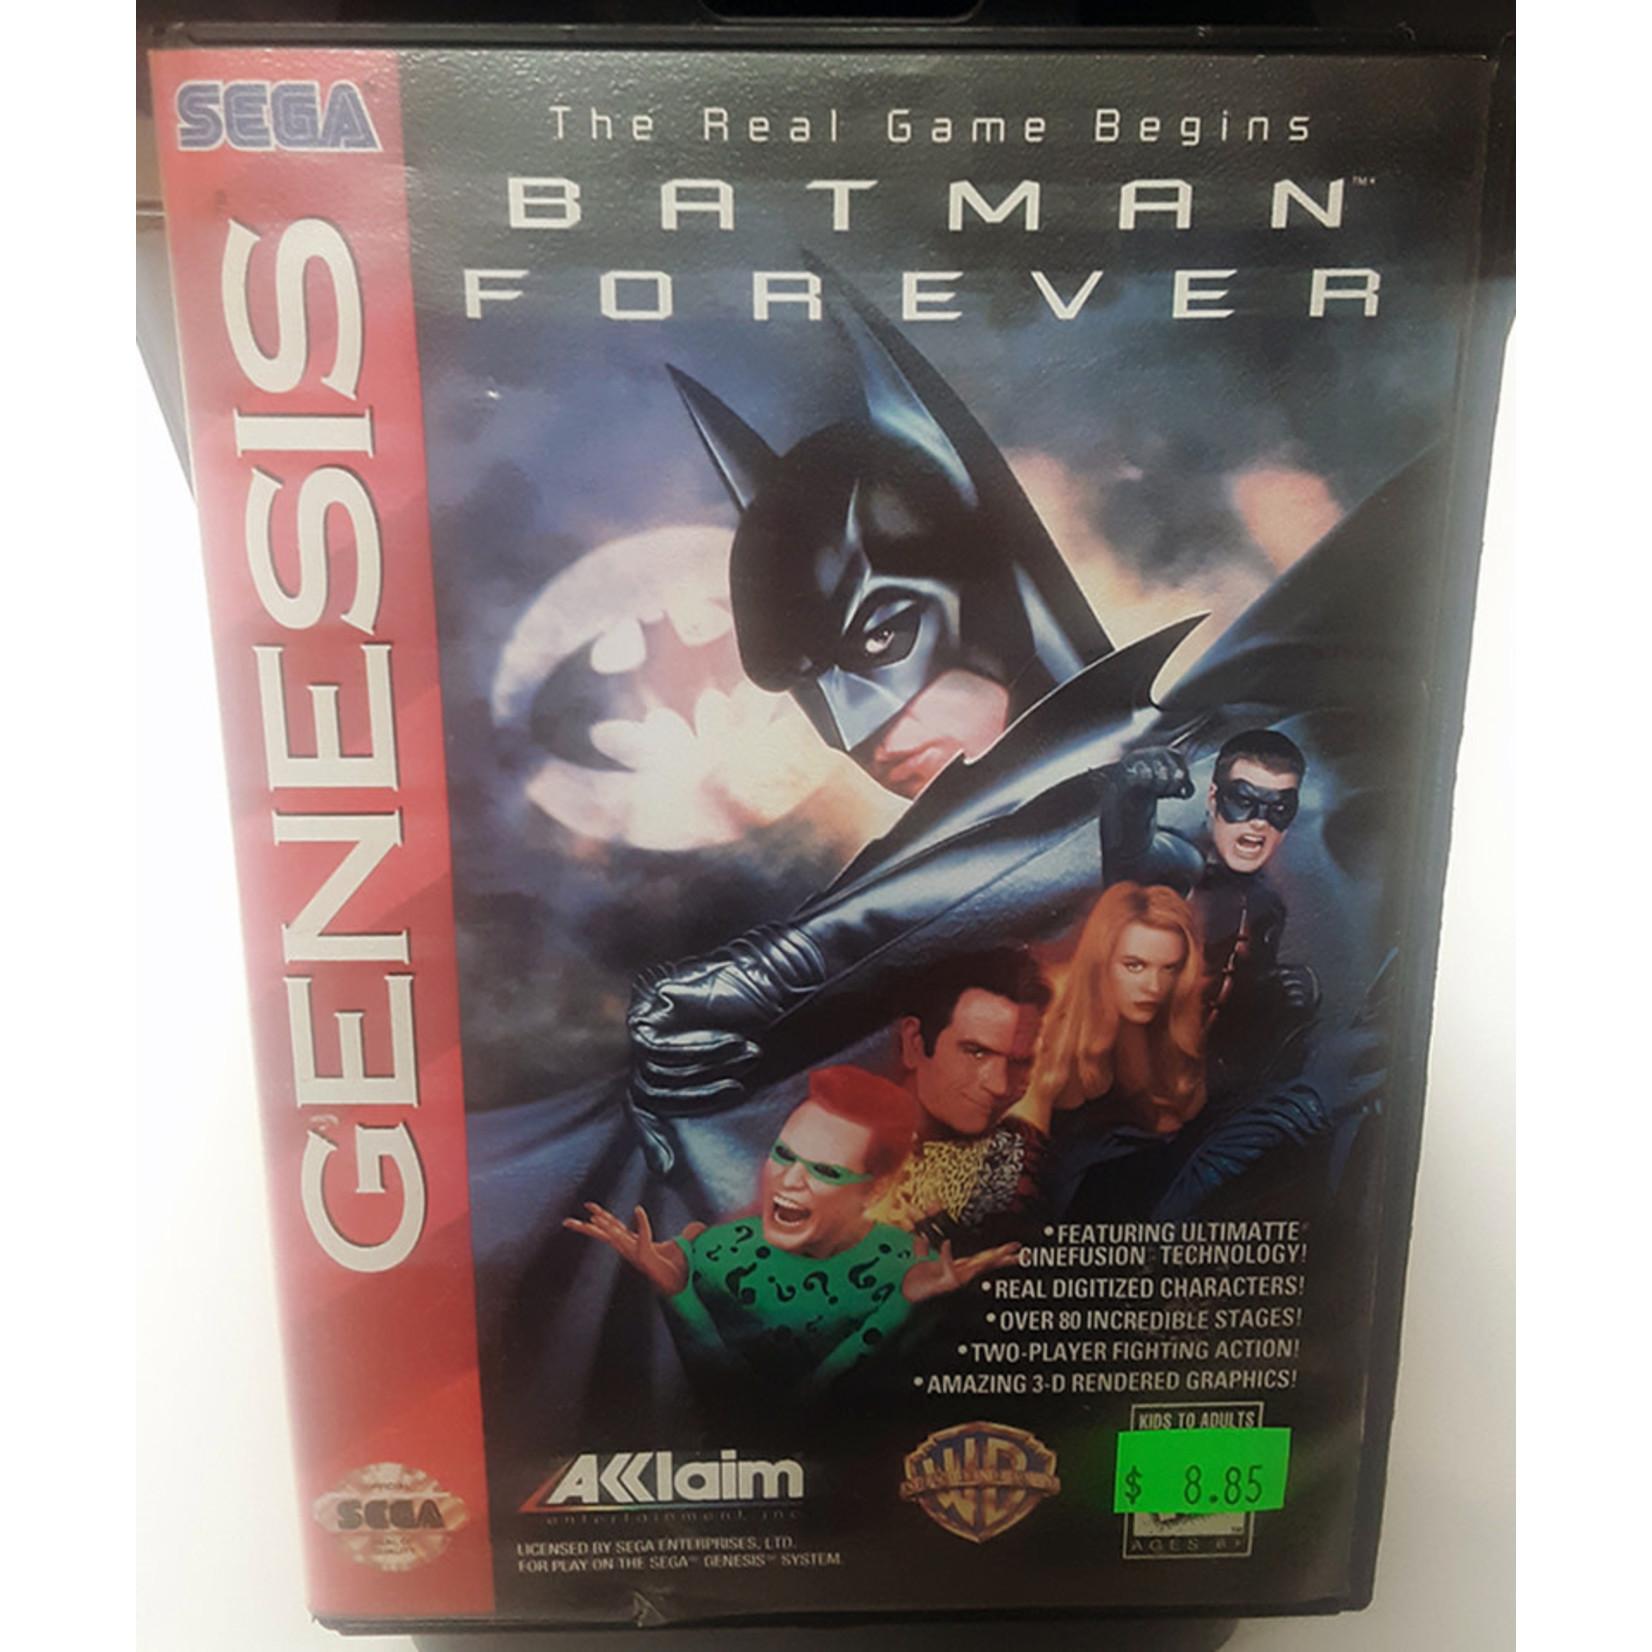 SGU-Batman Forever (boxed)